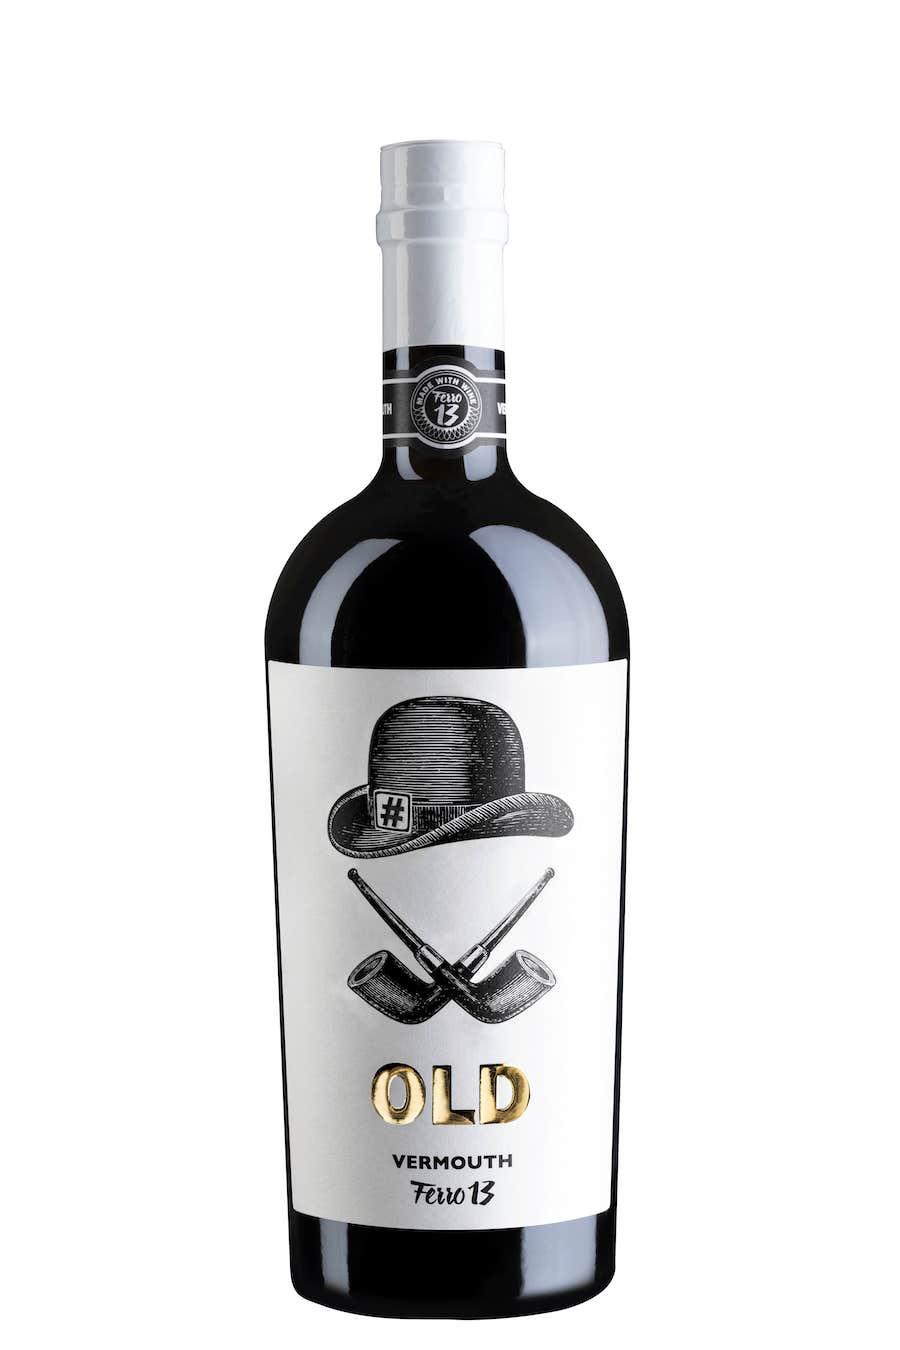 ferro13 vermouth old